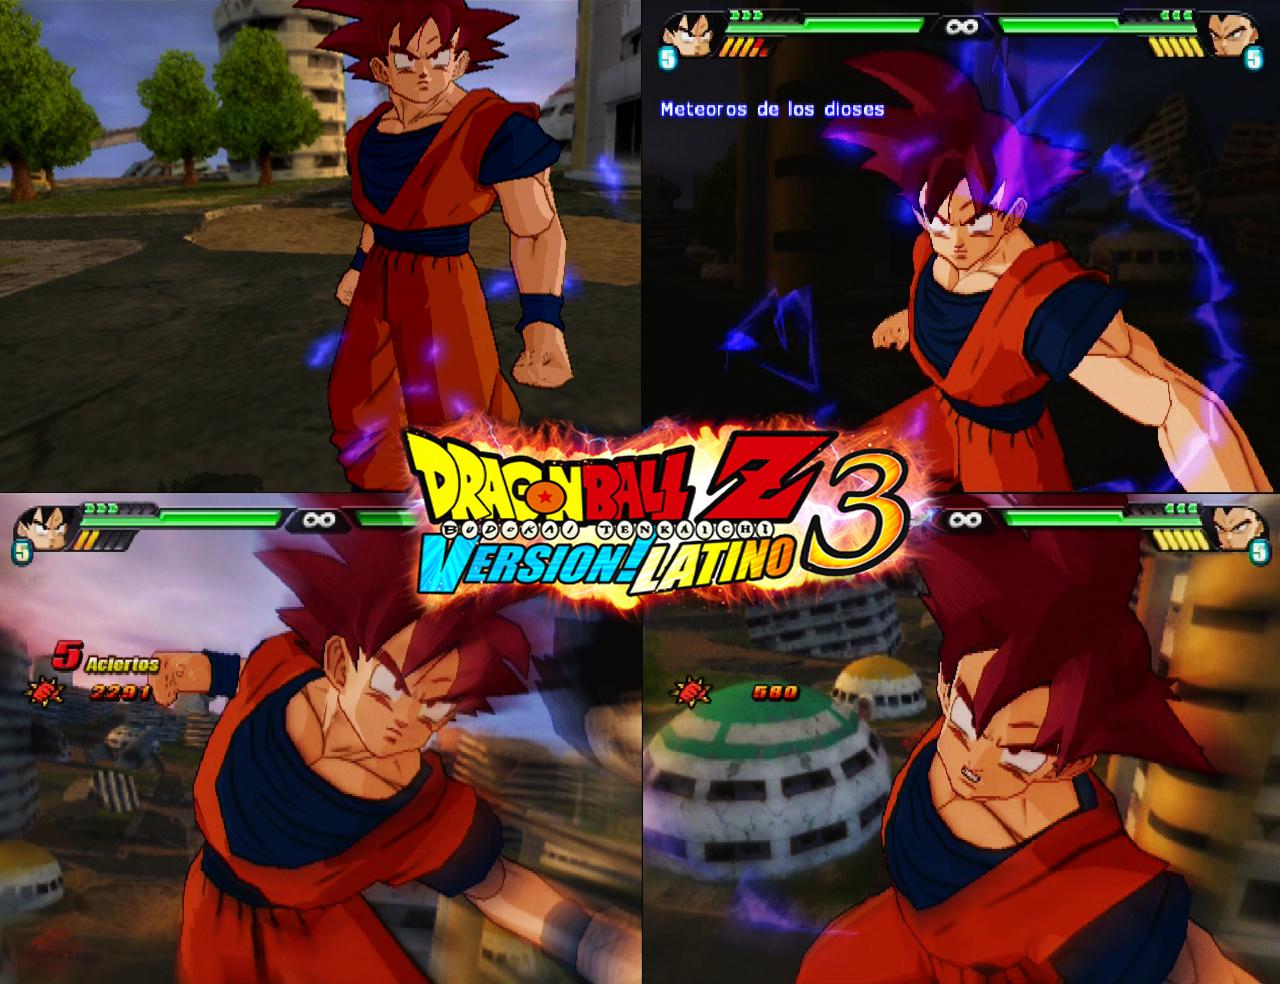 Goku Super Sayayin Dios Azul Para Colorear: Imagenesde99: Imagenes De Goku Dios Para Colorear